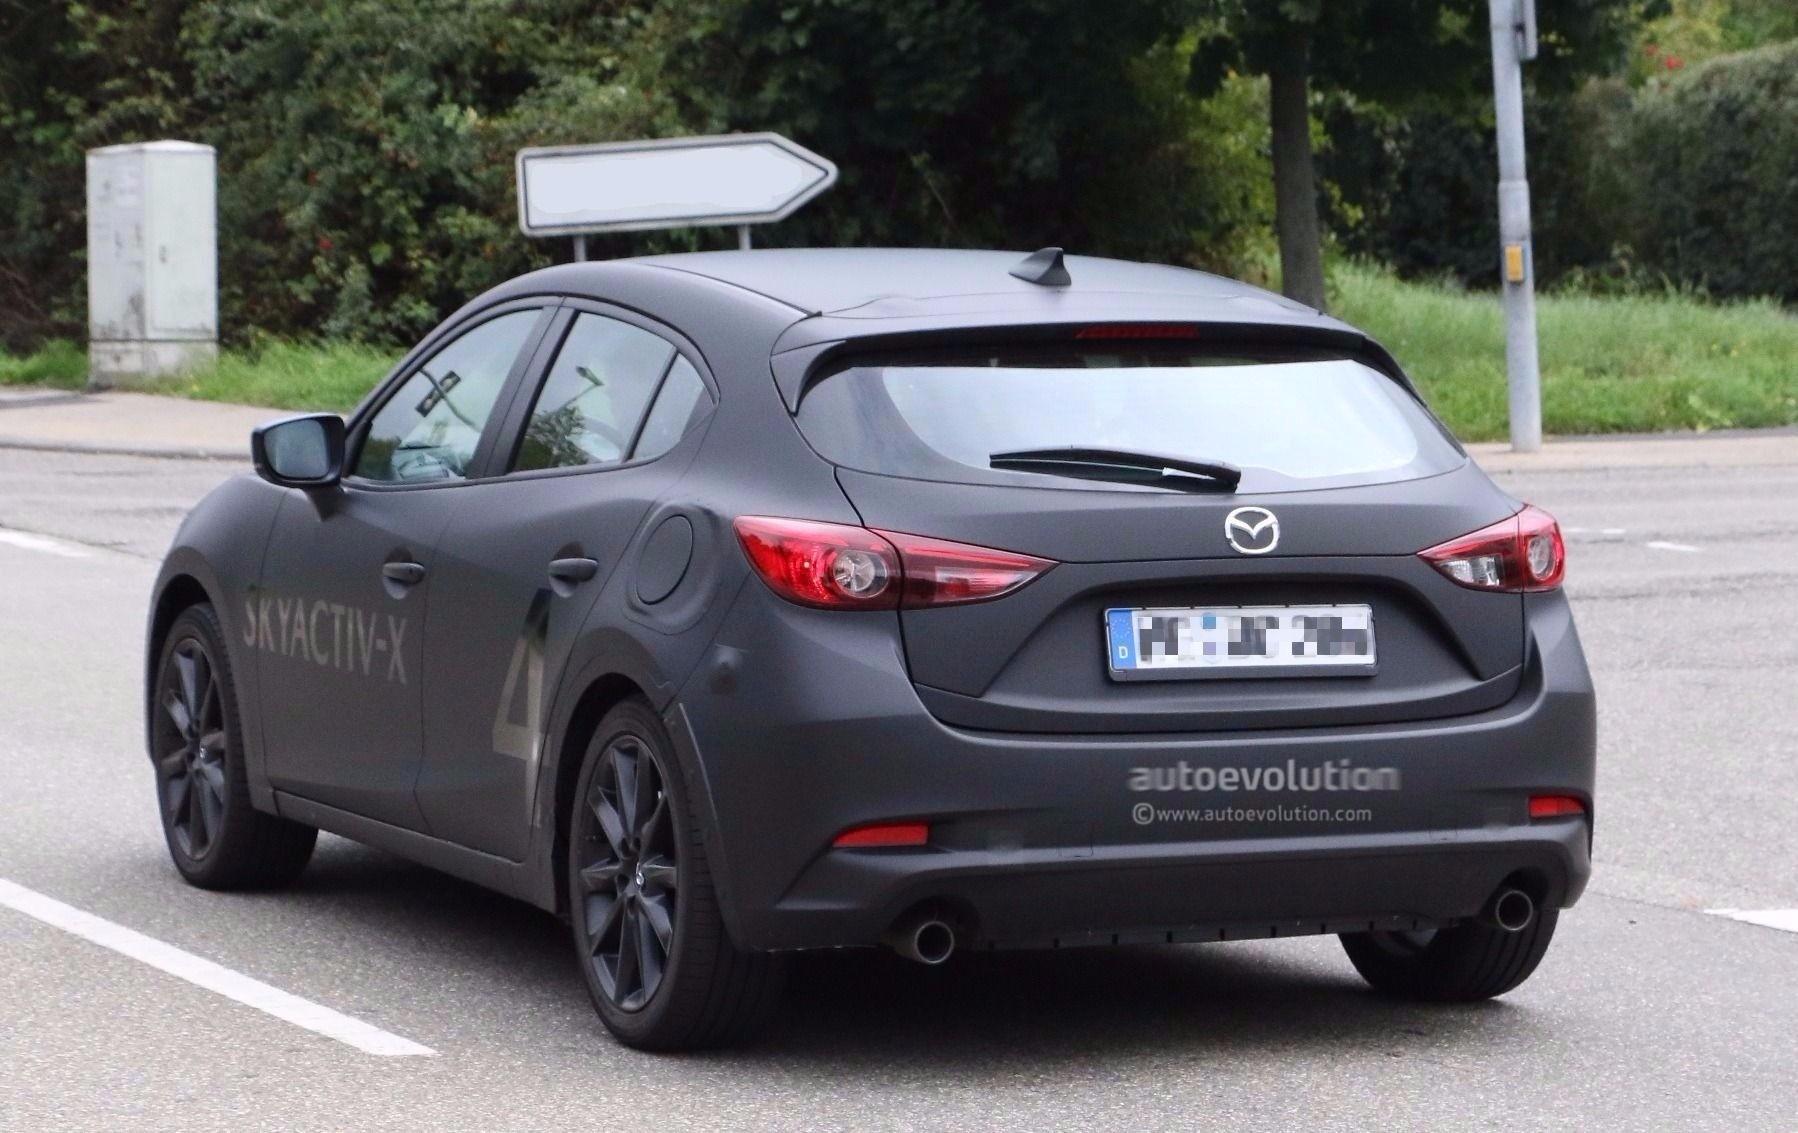 Spyshots 2019 Mazda3 SkyActiv X Mule Testing With 2017